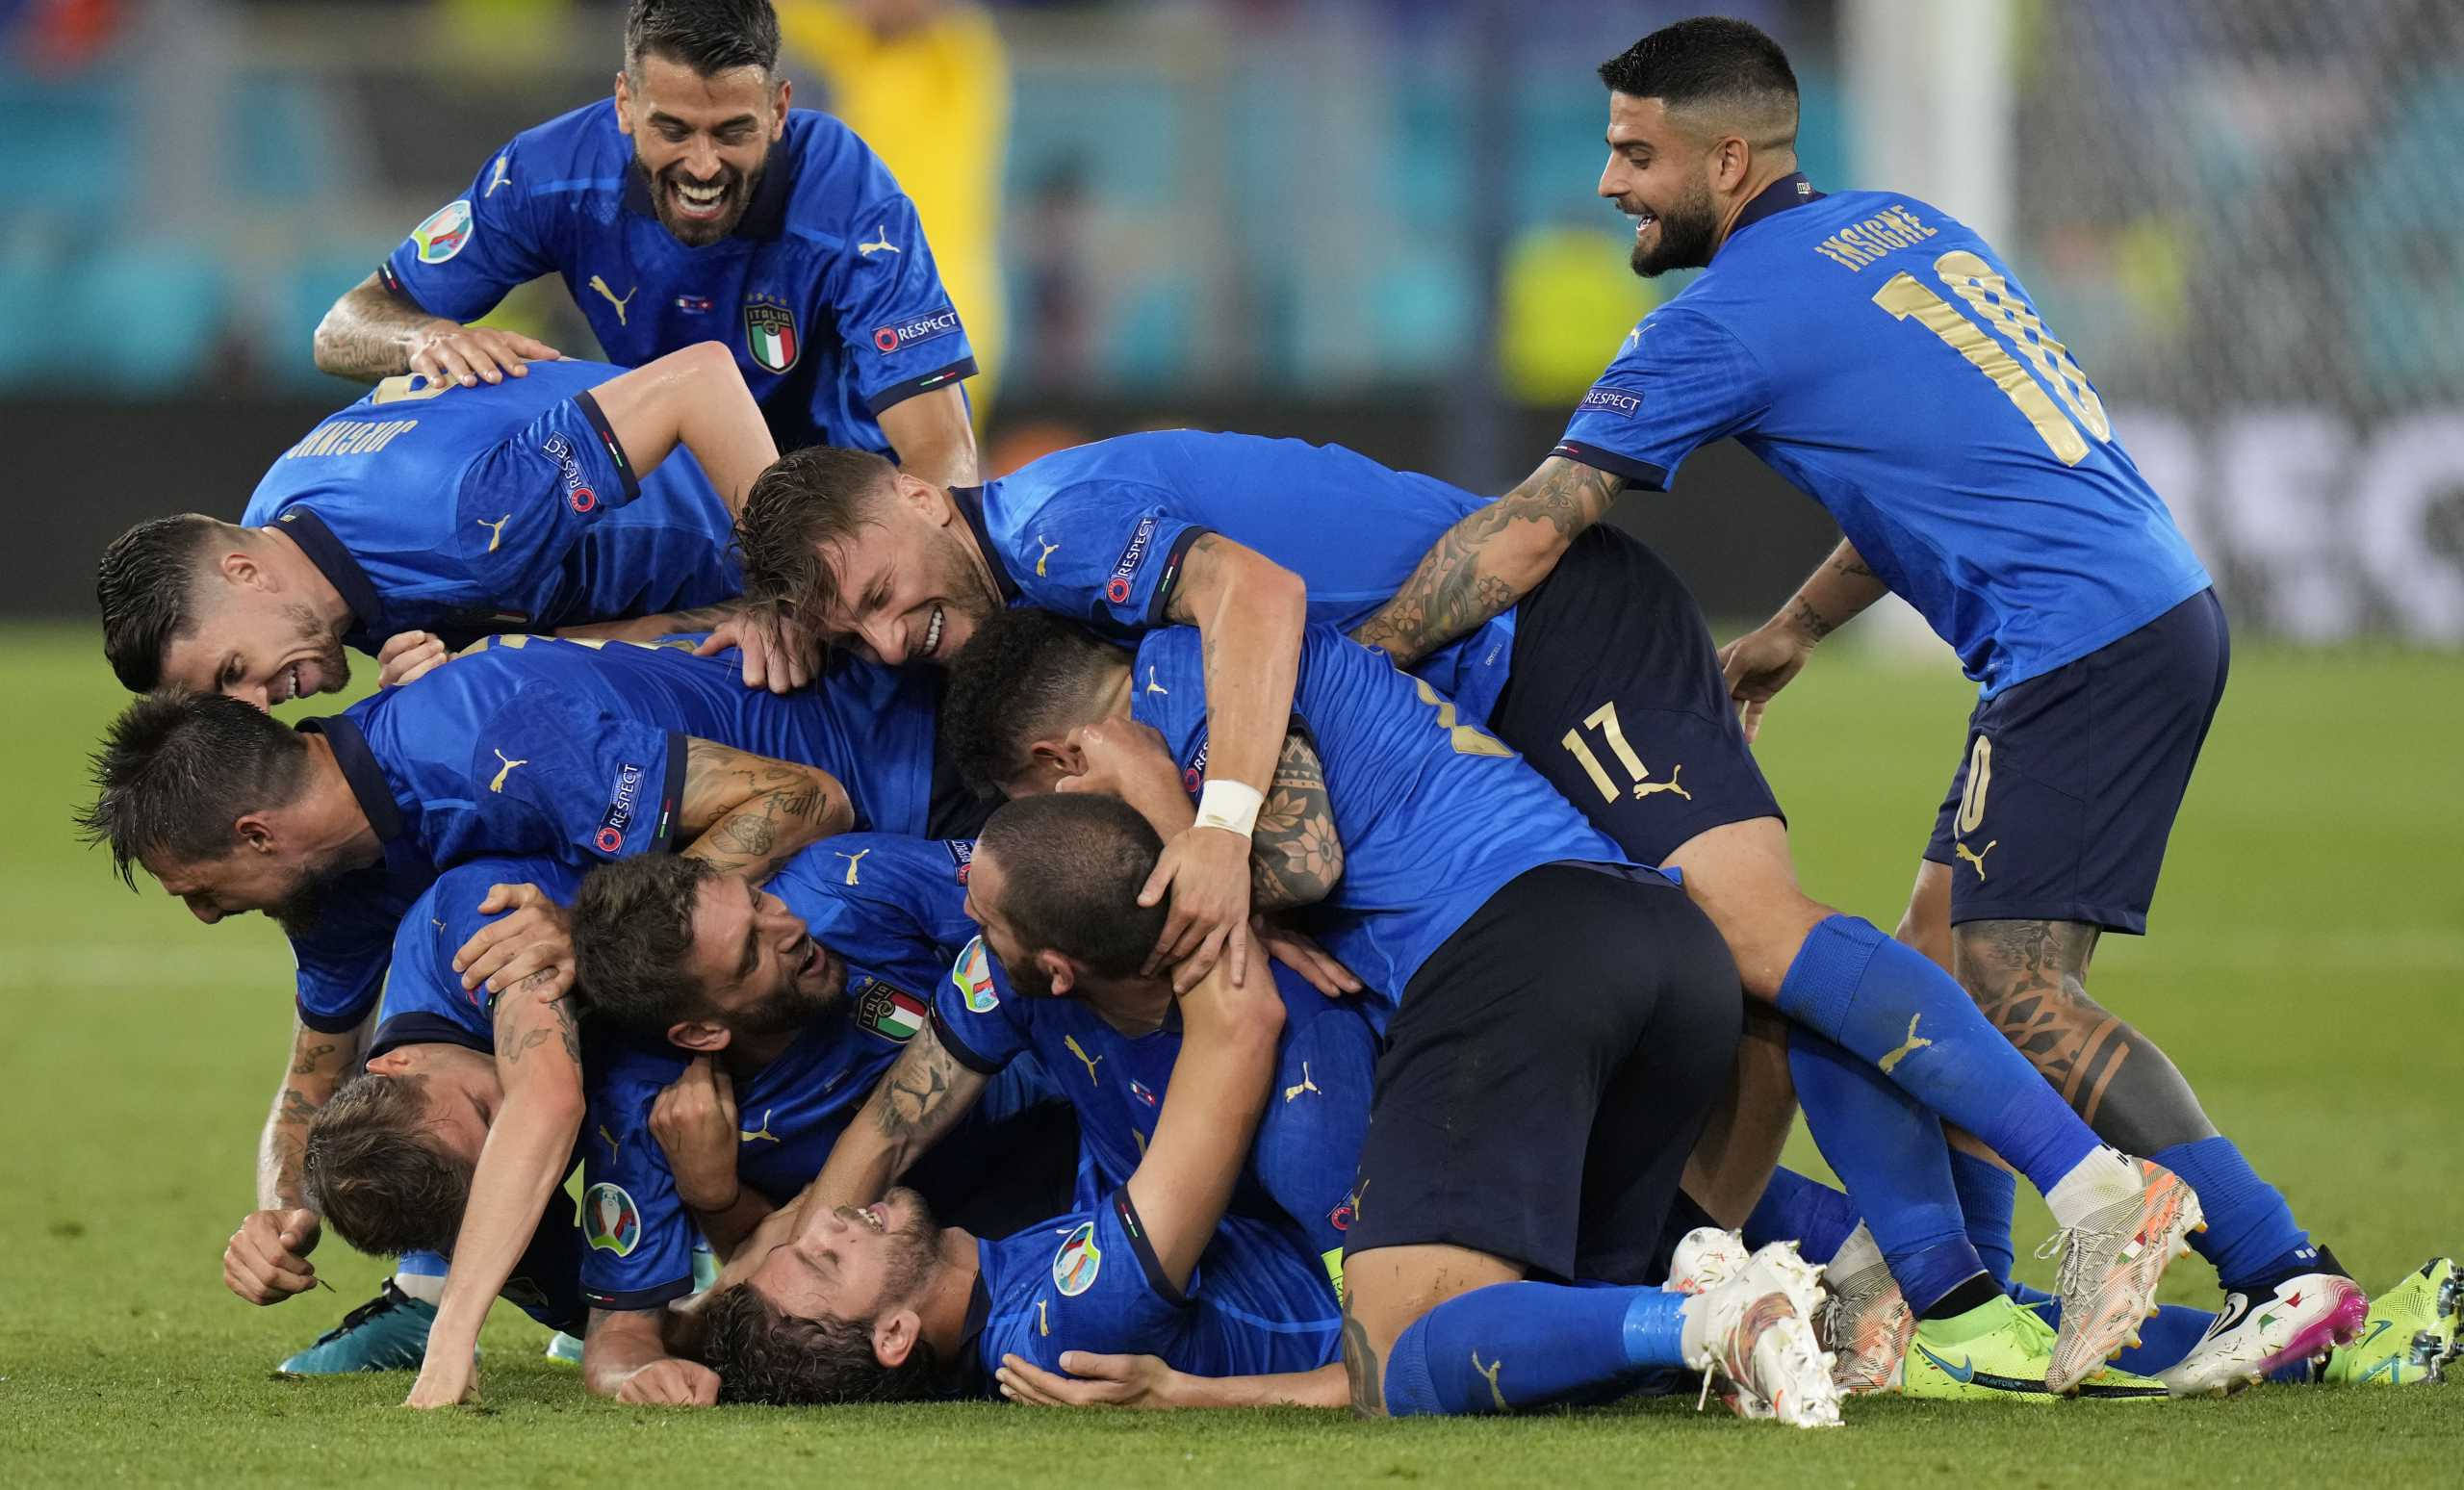 Euro 2020, Ιταλία – Ελβετία 3-0: Έστειλαν μηνύματα οι φοβεροί Ιταλοί